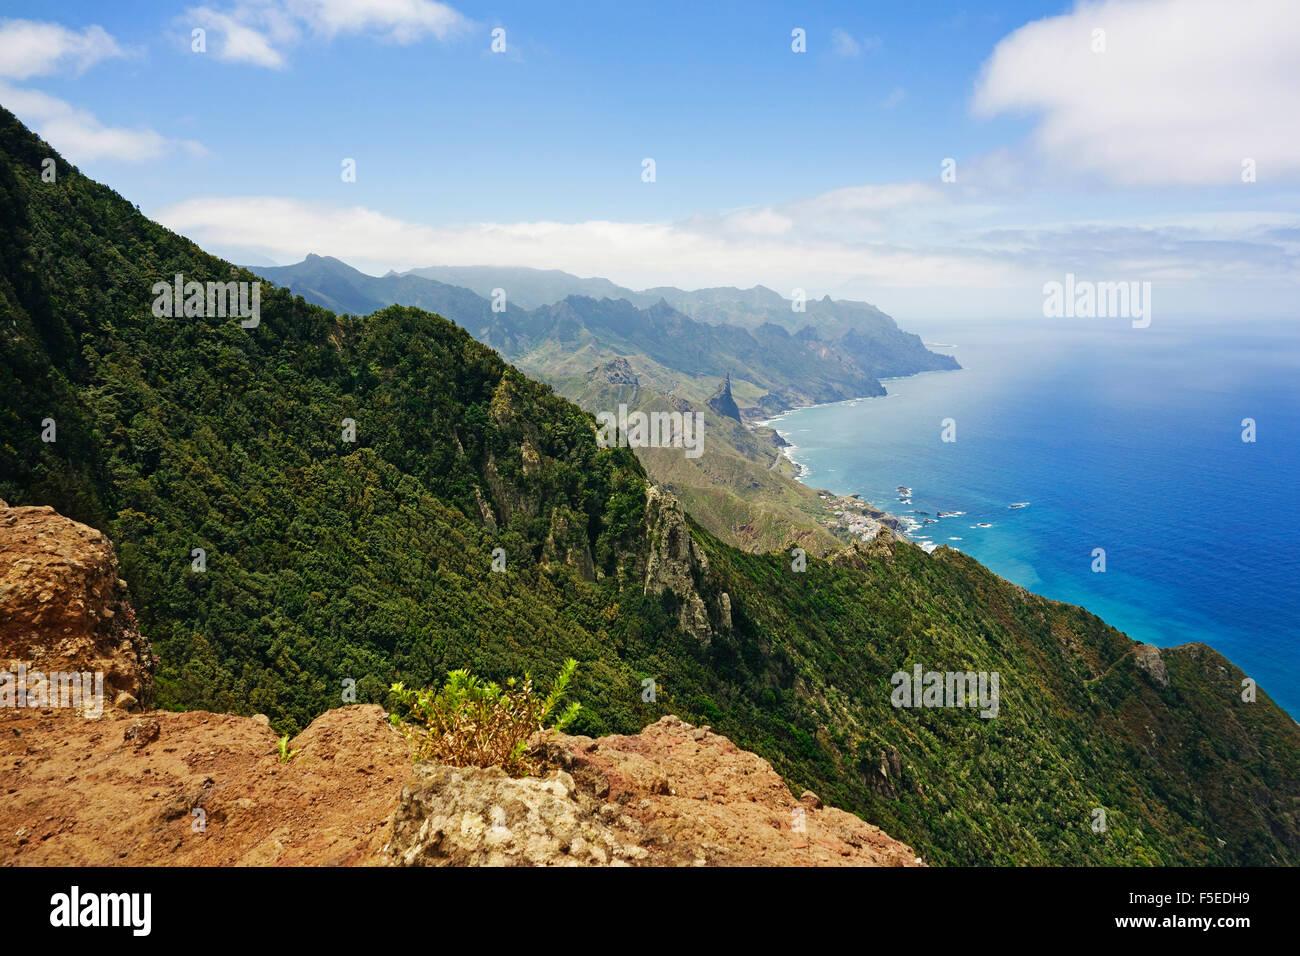 Anaga-Gebirge und Costa Adeje, Teneriffa, Kanarische Inseln, Spanien, Atlantik, Europa Stockfoto